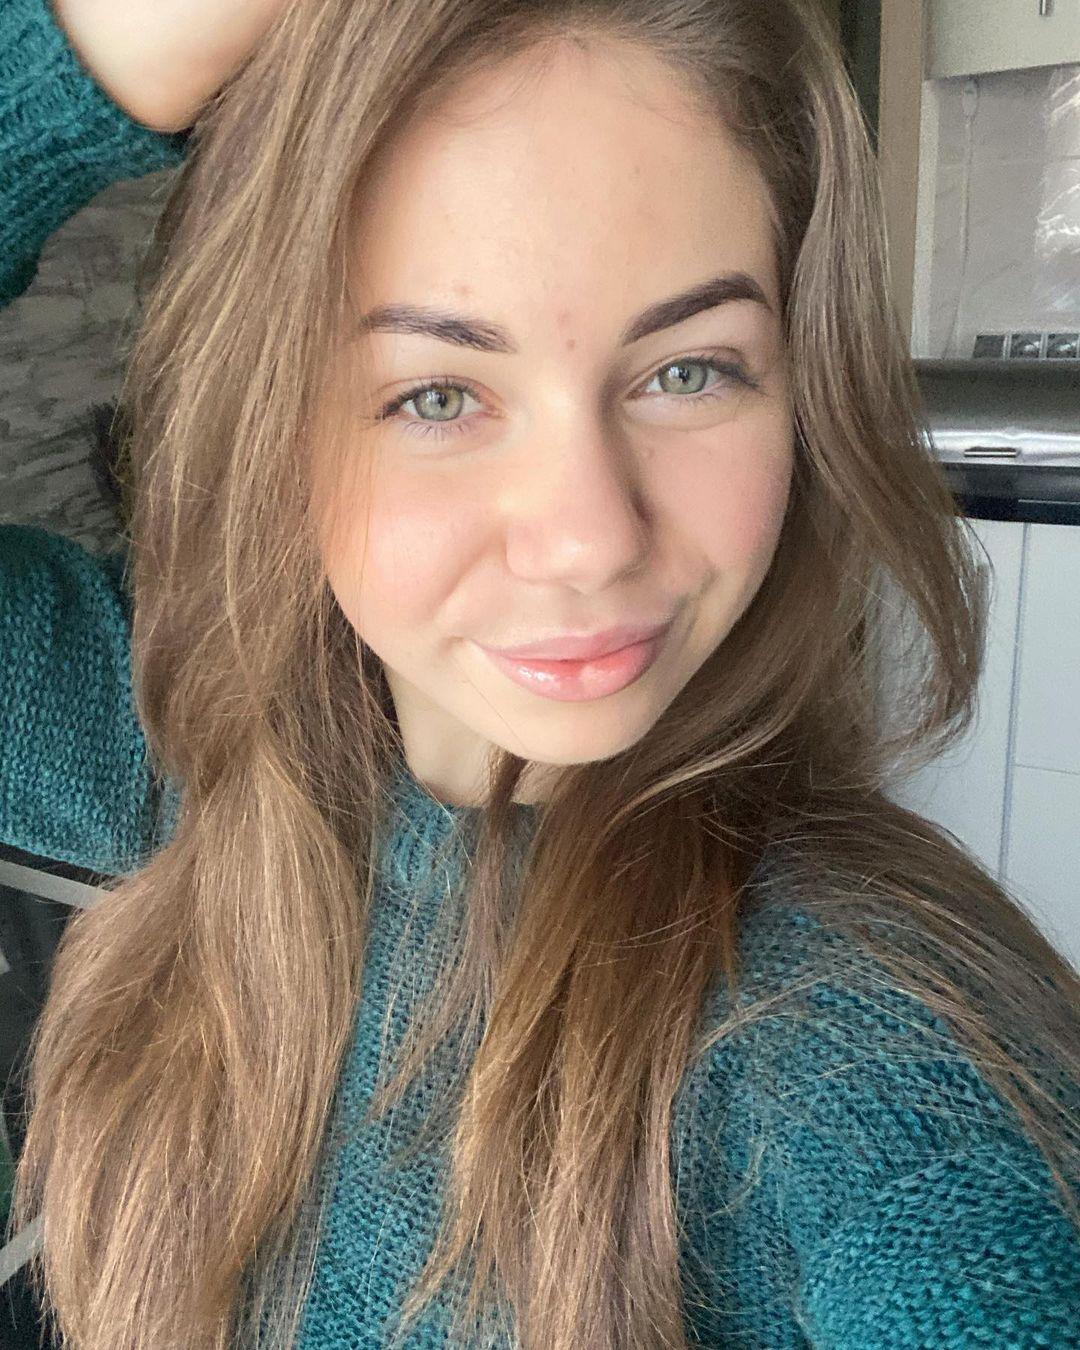 Cathy-Bulgakova-Wallpapers-Insta-Fit-Bio-5